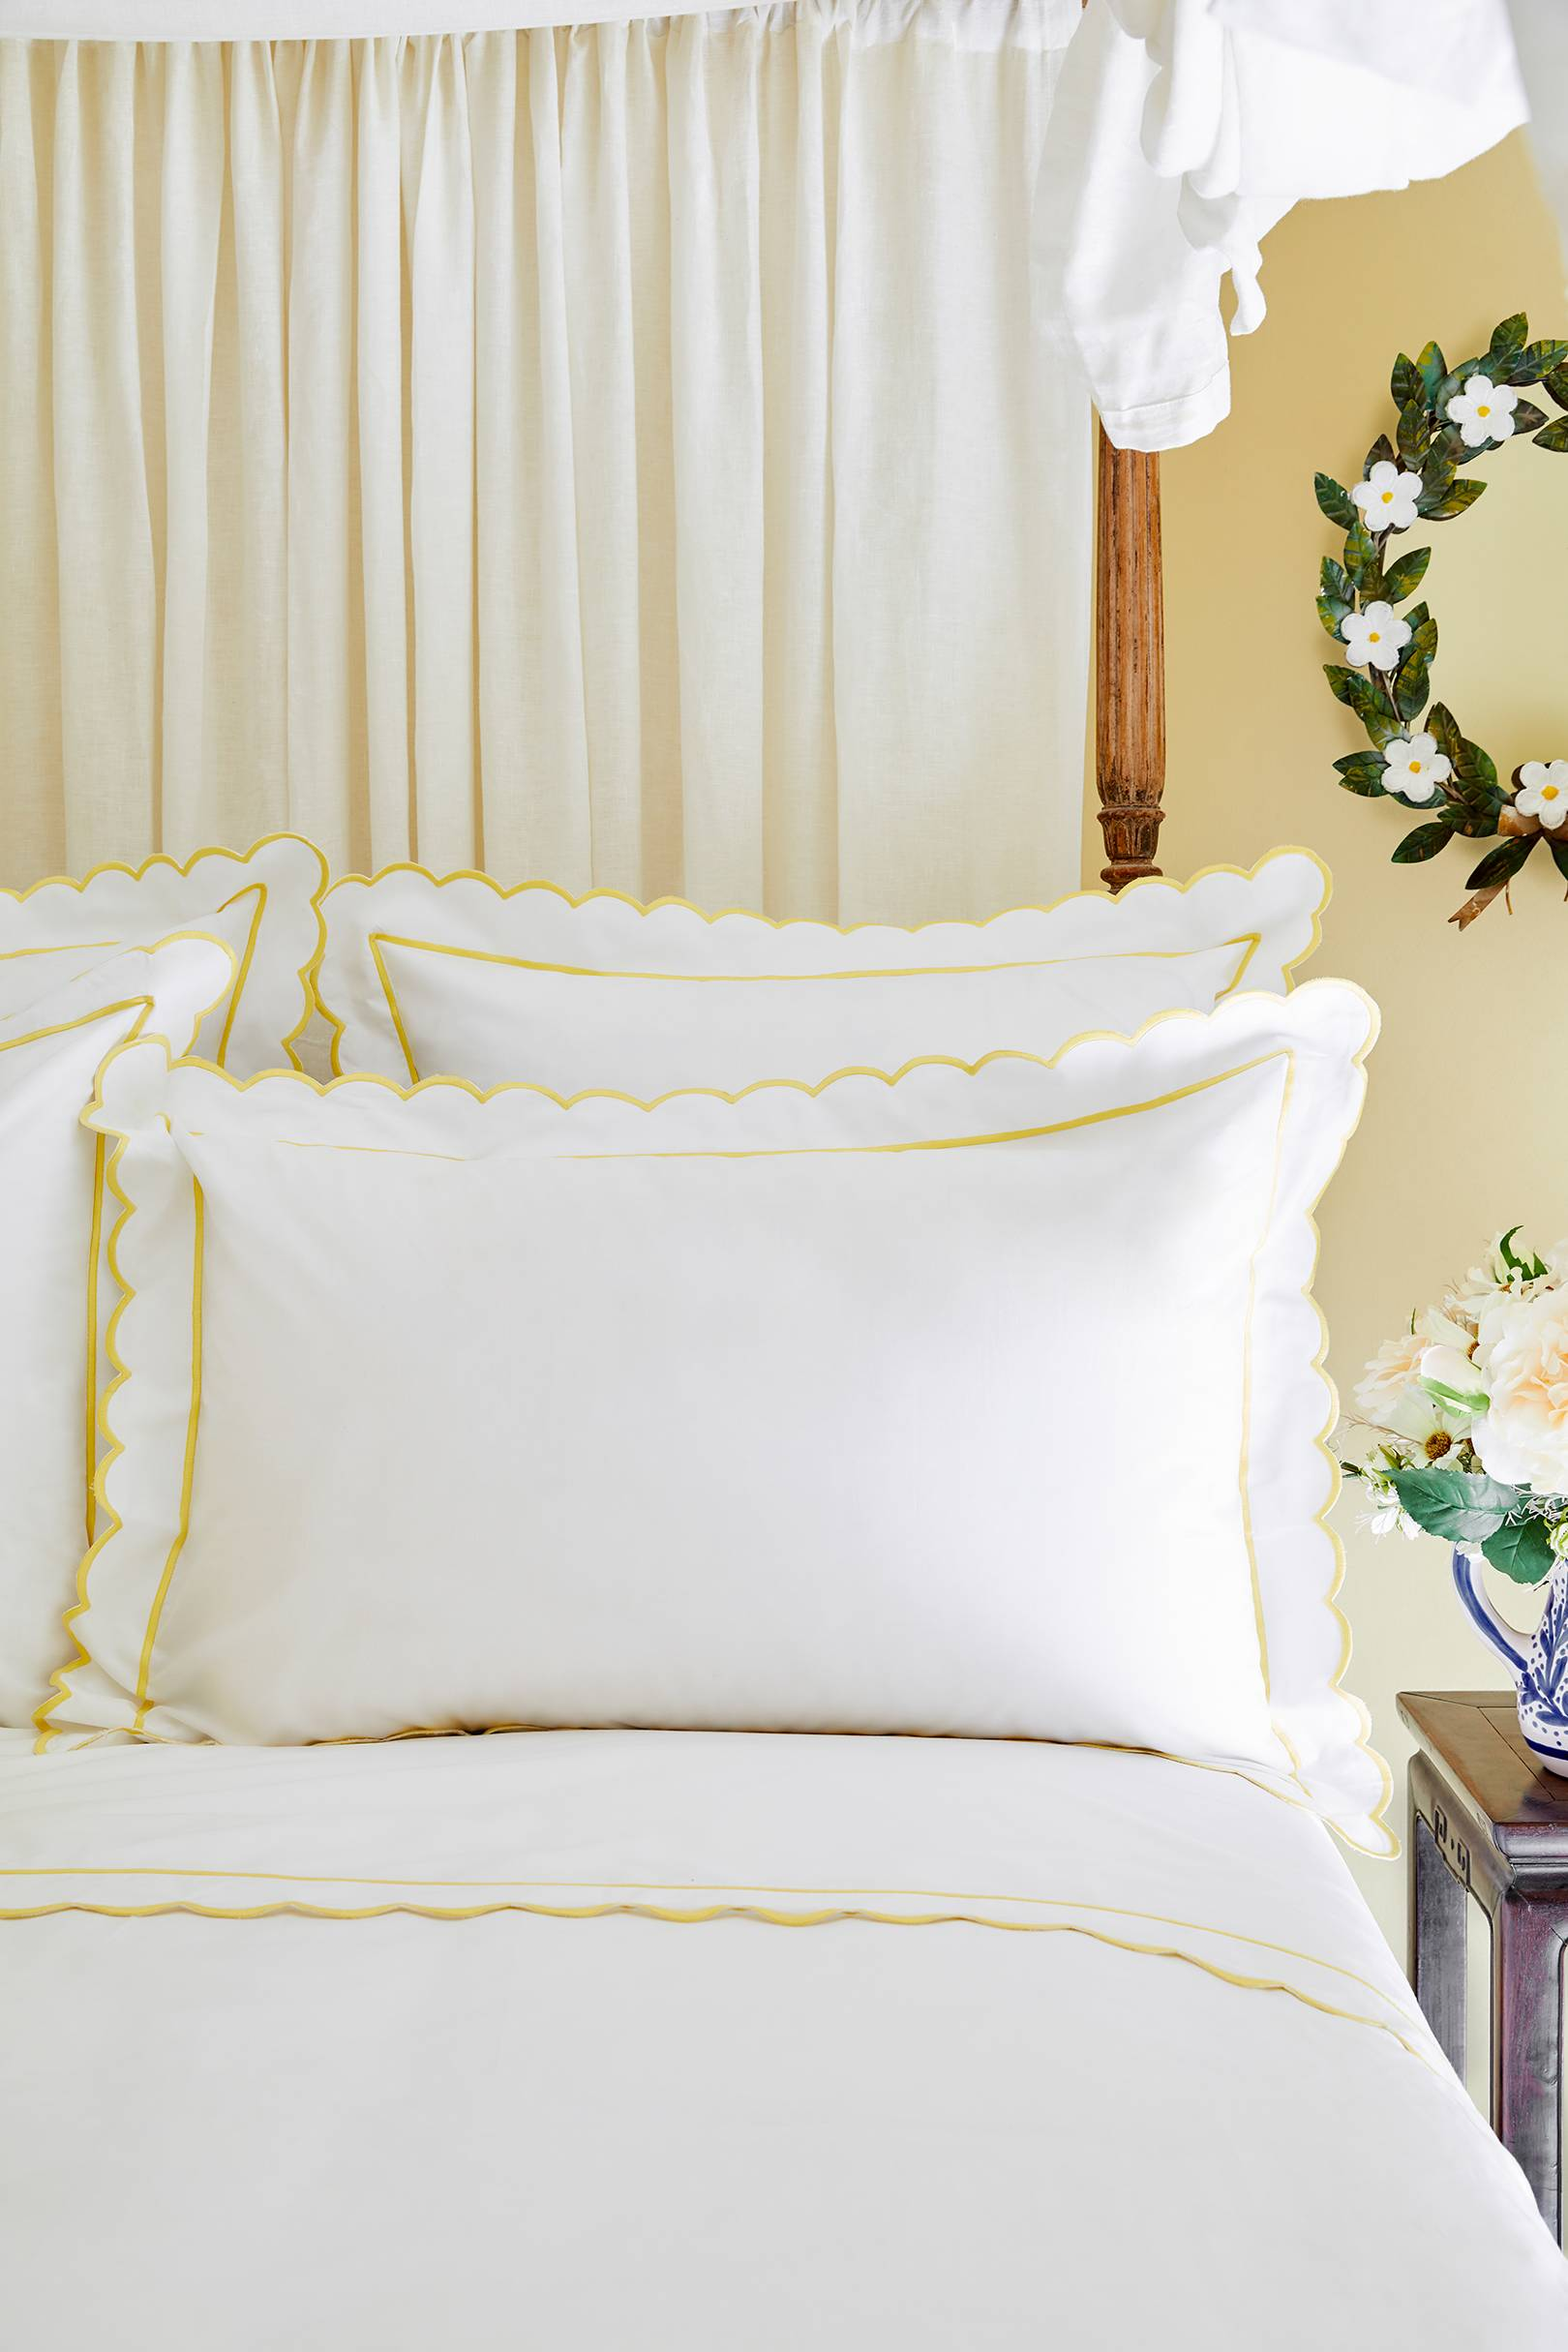 Cream White Linen Bed Pillowcase Made